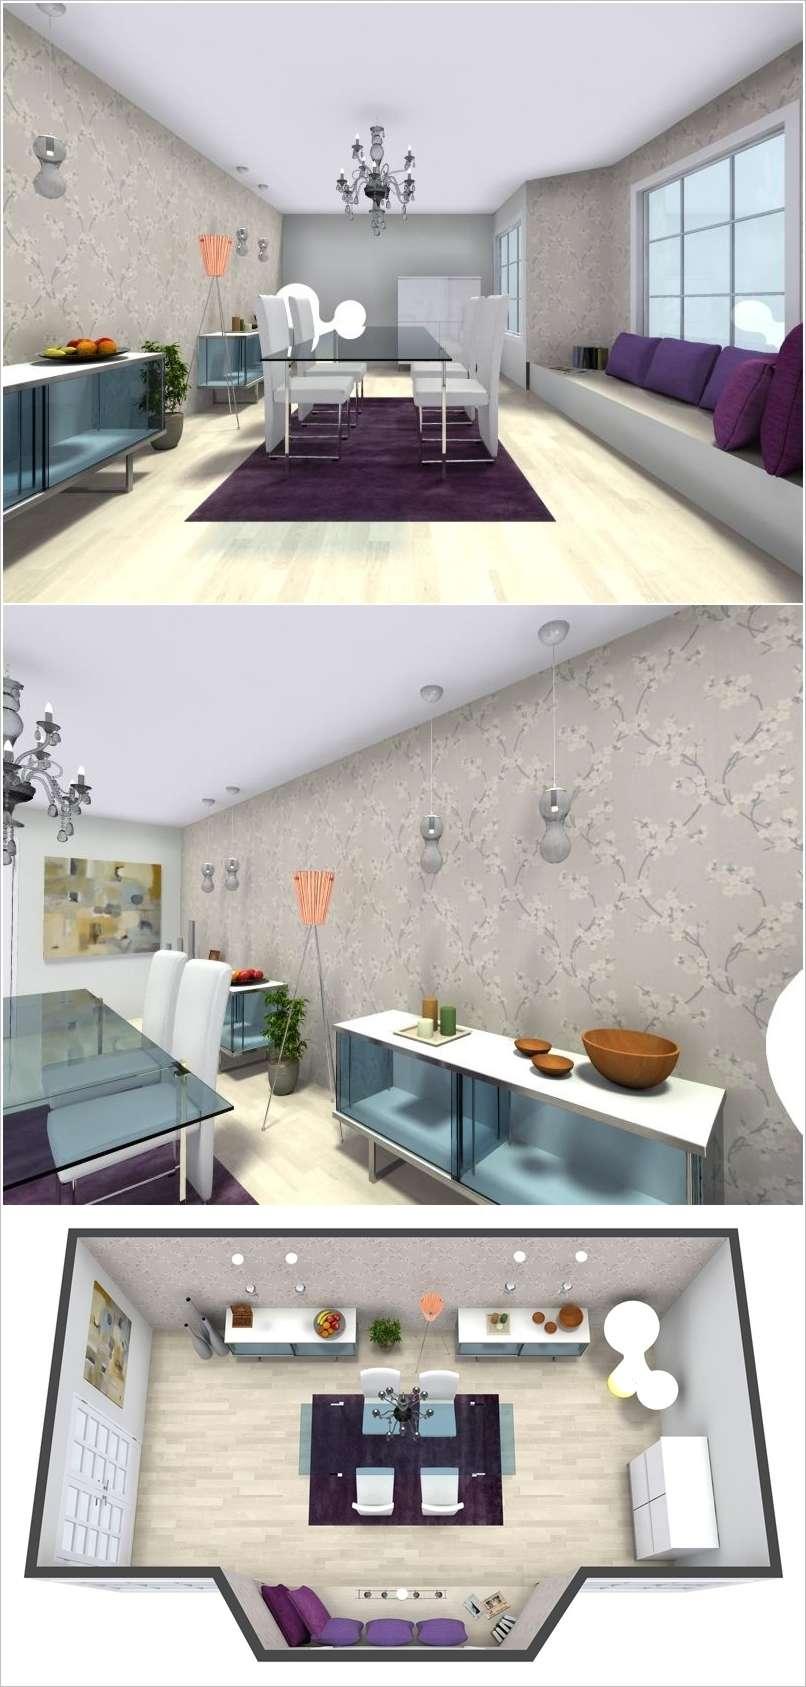 10 Best Designs Of Roomsketcher A Wonderful 3d Design